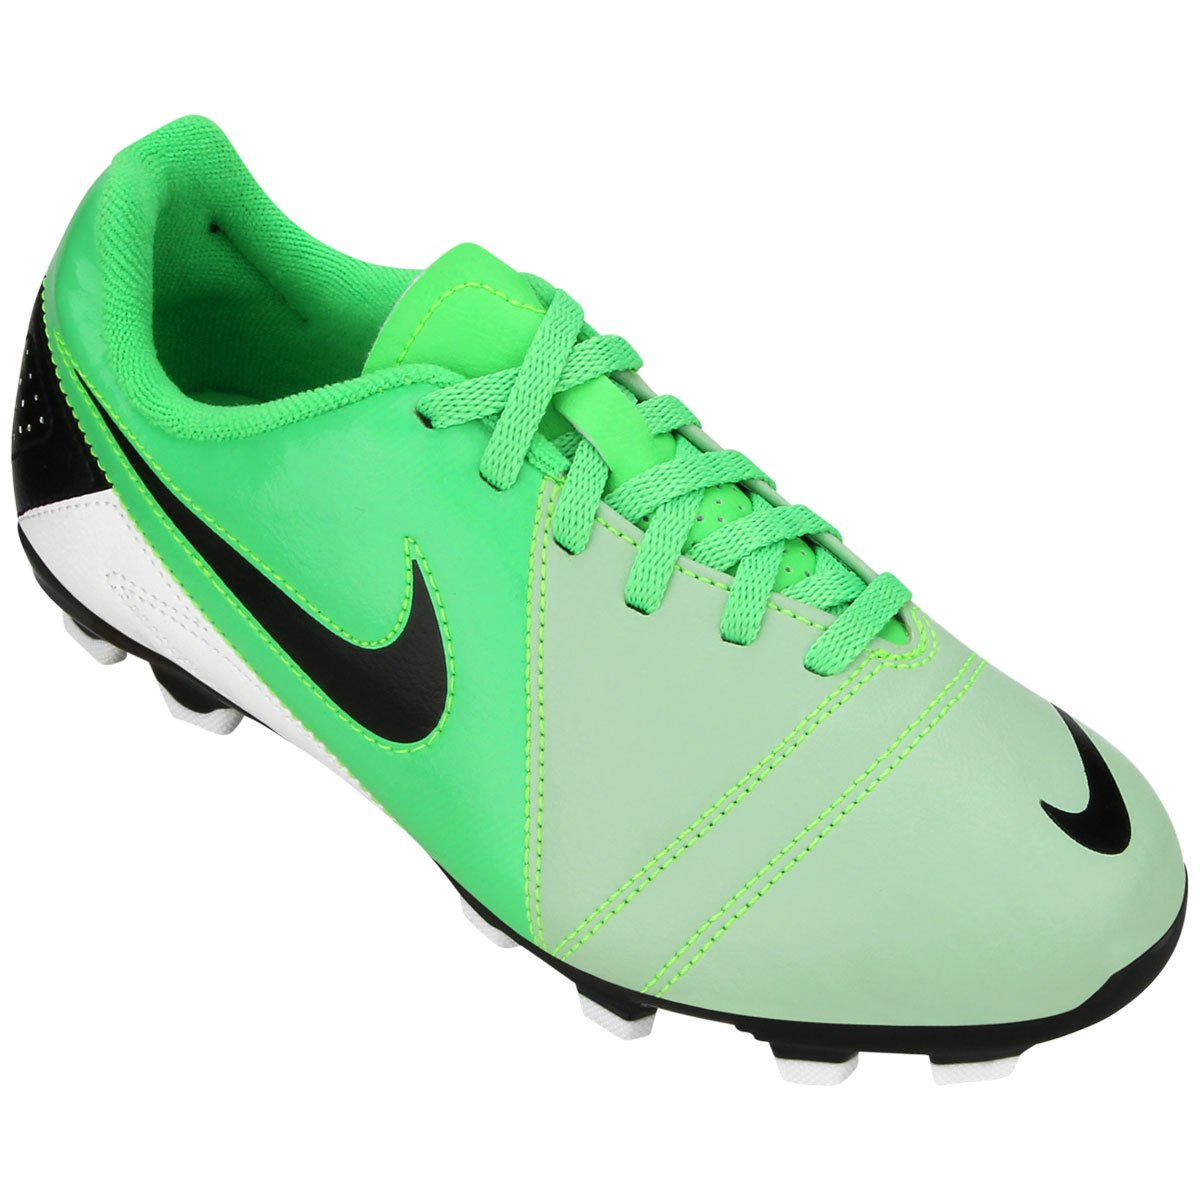 Chuteira Nike CTR360 Enganche 3 FG Infantil - Compre Agora  81843391b822d